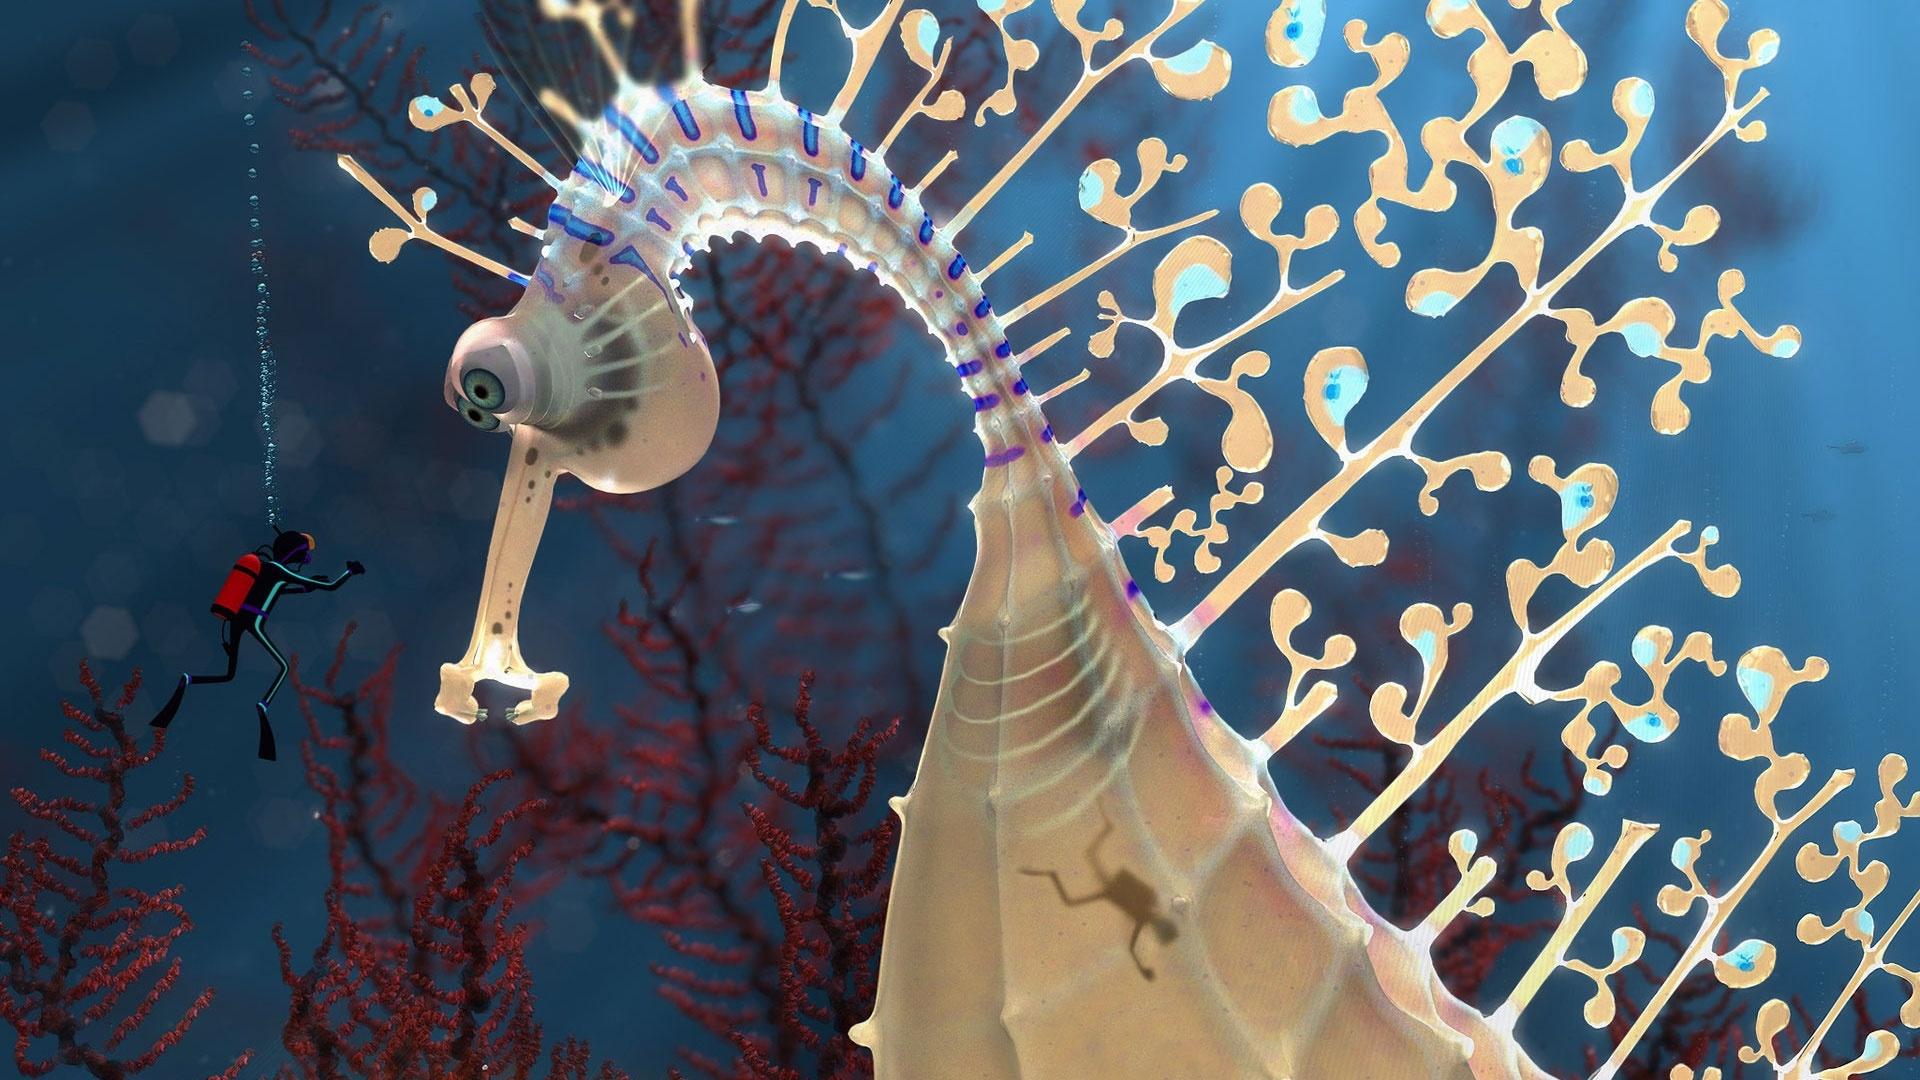 Seahorse Desktop Wallpaper